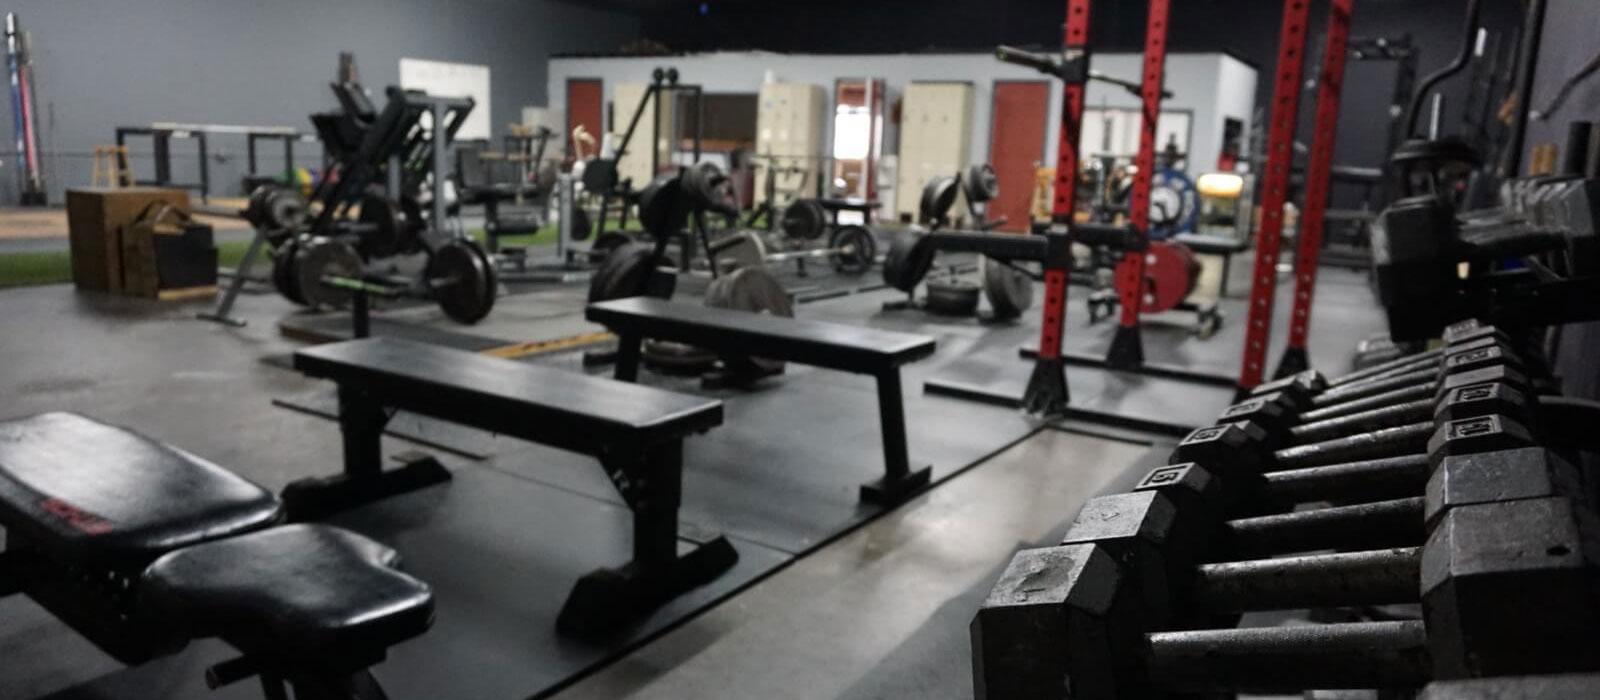 Workout in Pinellas Park FL, Workout near St Petersburg FL, Workout near Clearwater FL, Workout near Tampa Bay FL